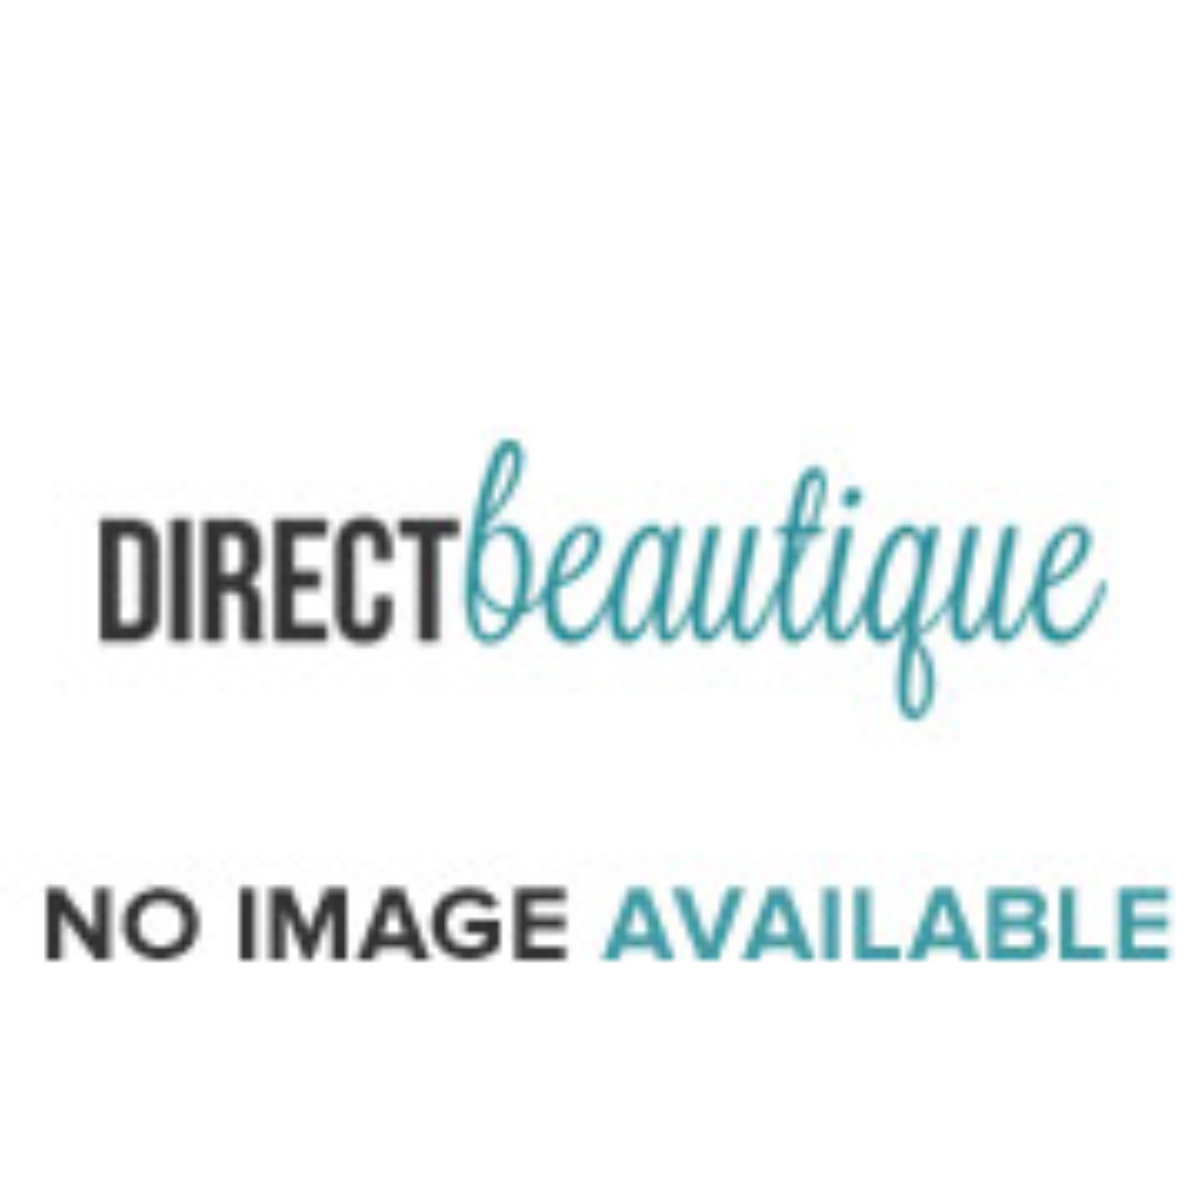 Clarins Hydra-Essentiel Cooling Gel Normal To Combination Skin 50ml